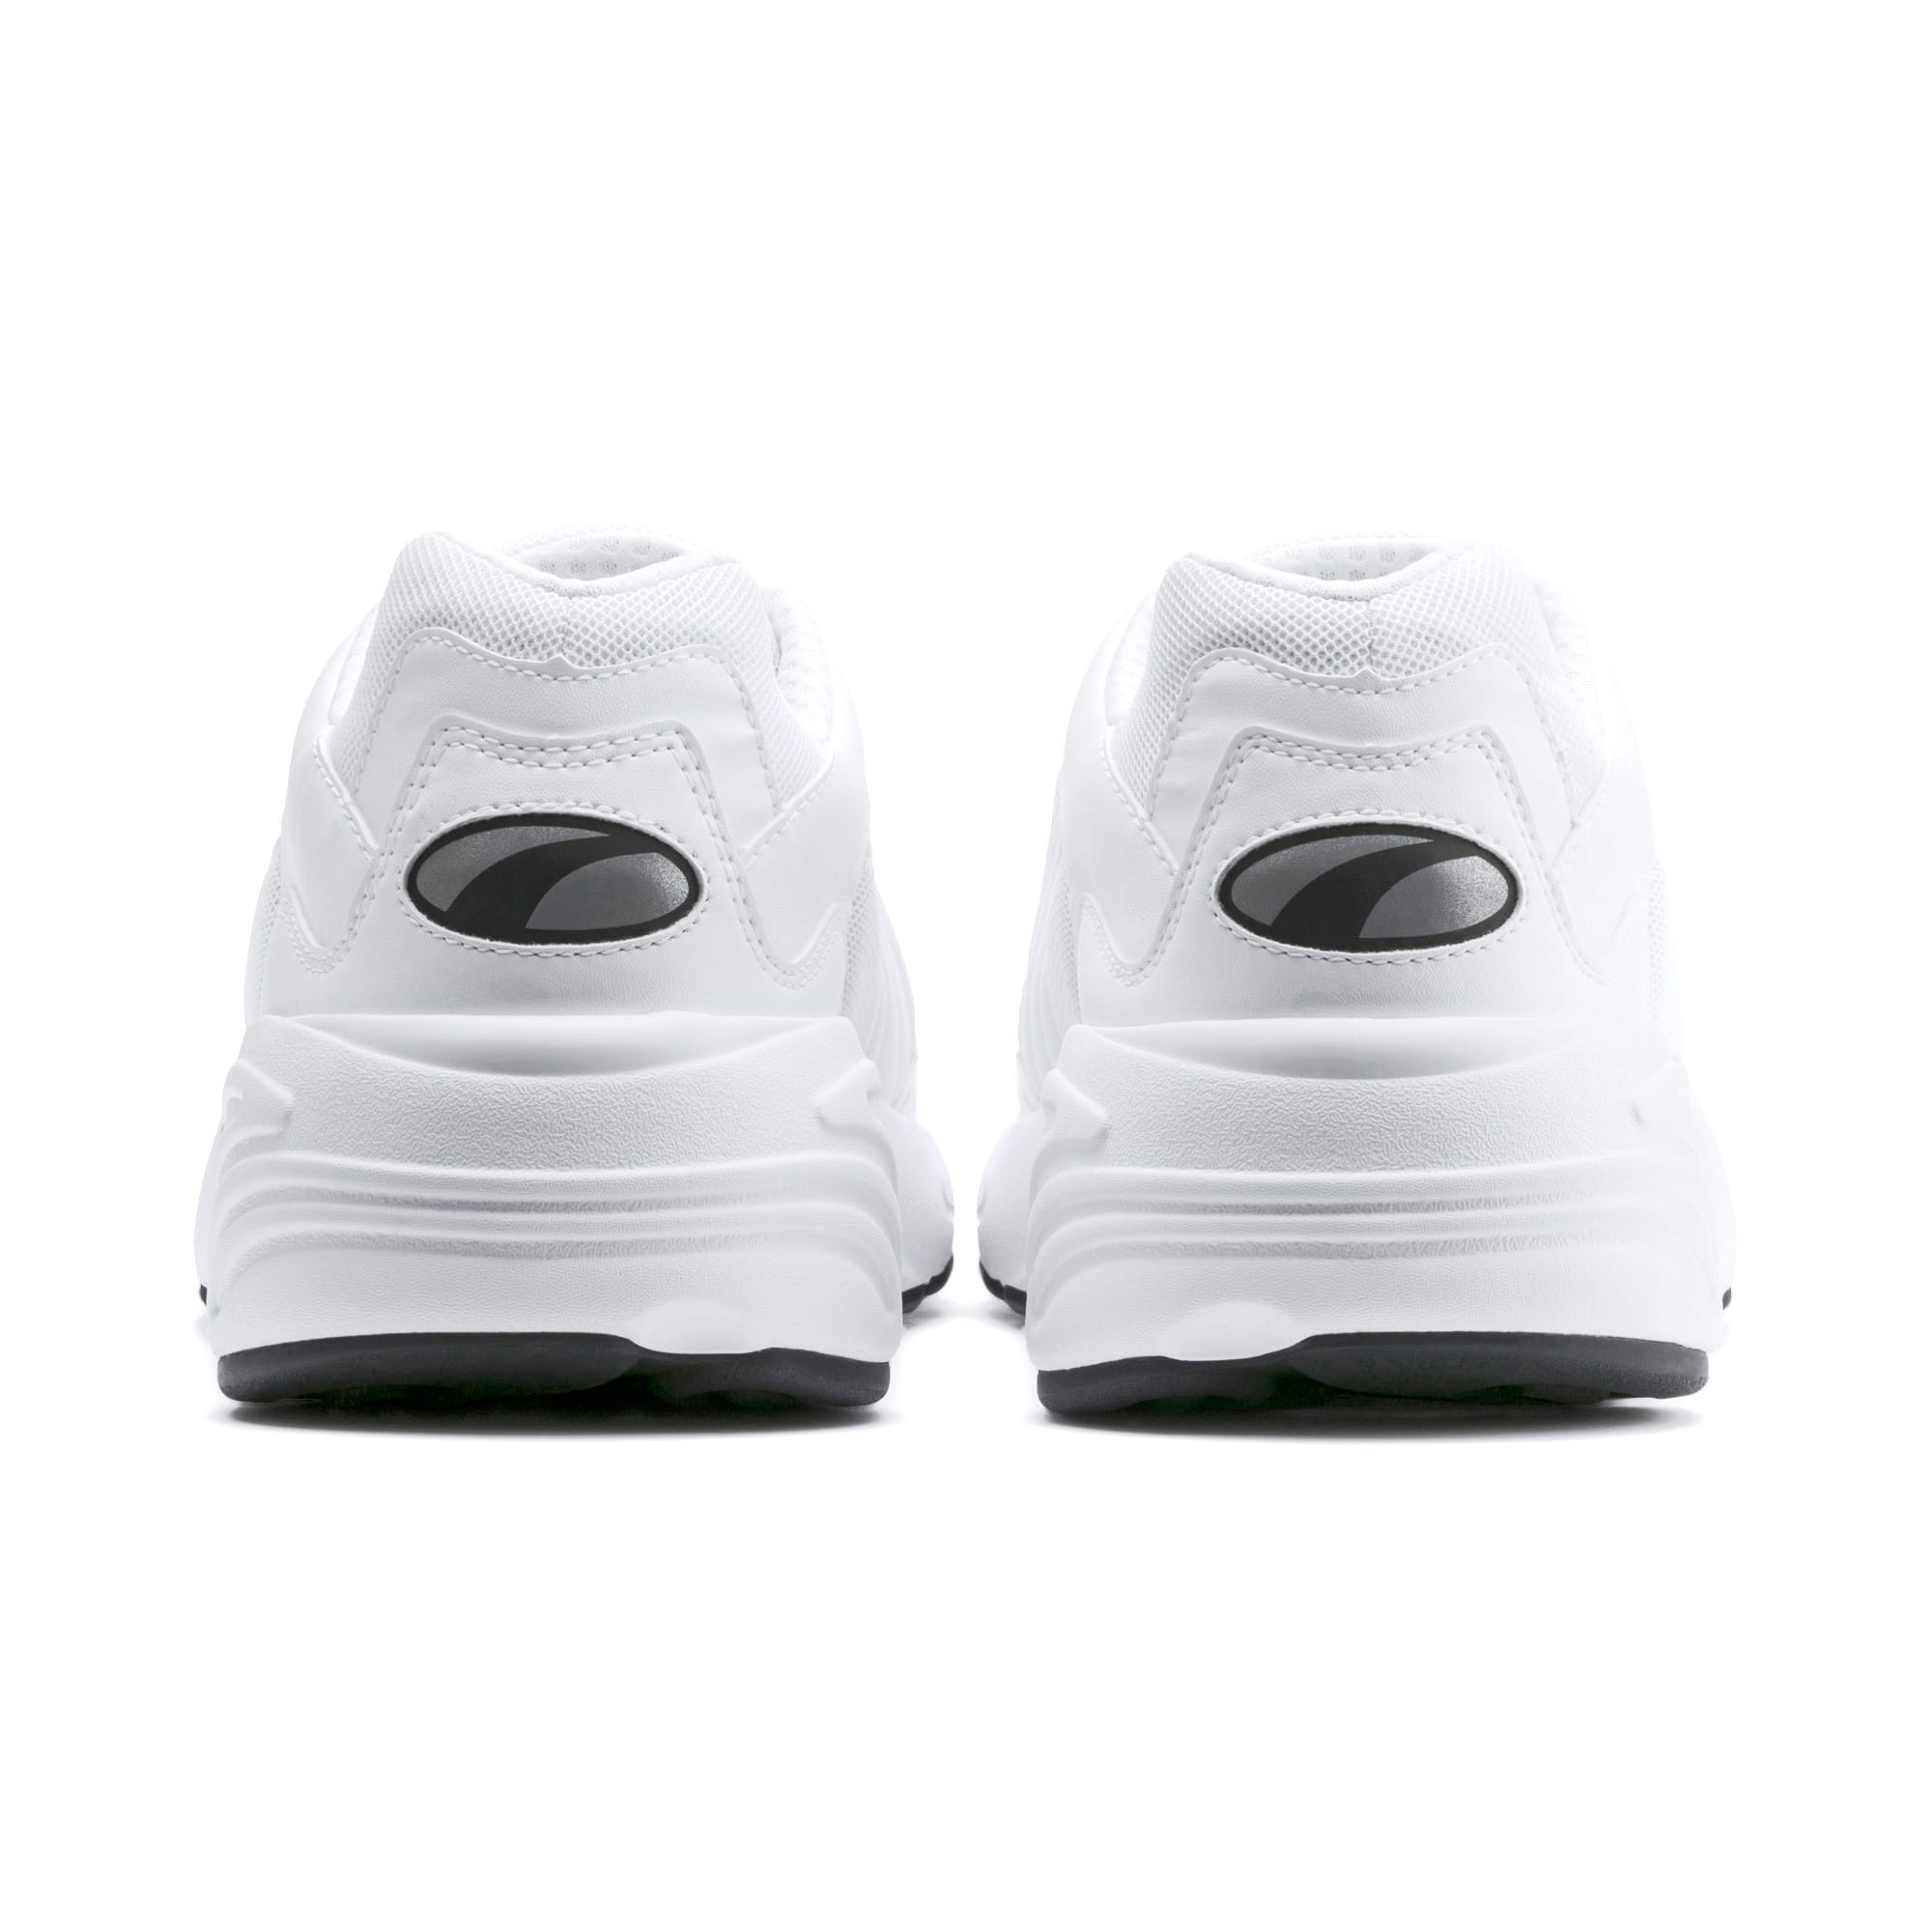 Thumbnail 3 of CELL Viper Sneakers, Puma White-Puma White, medium